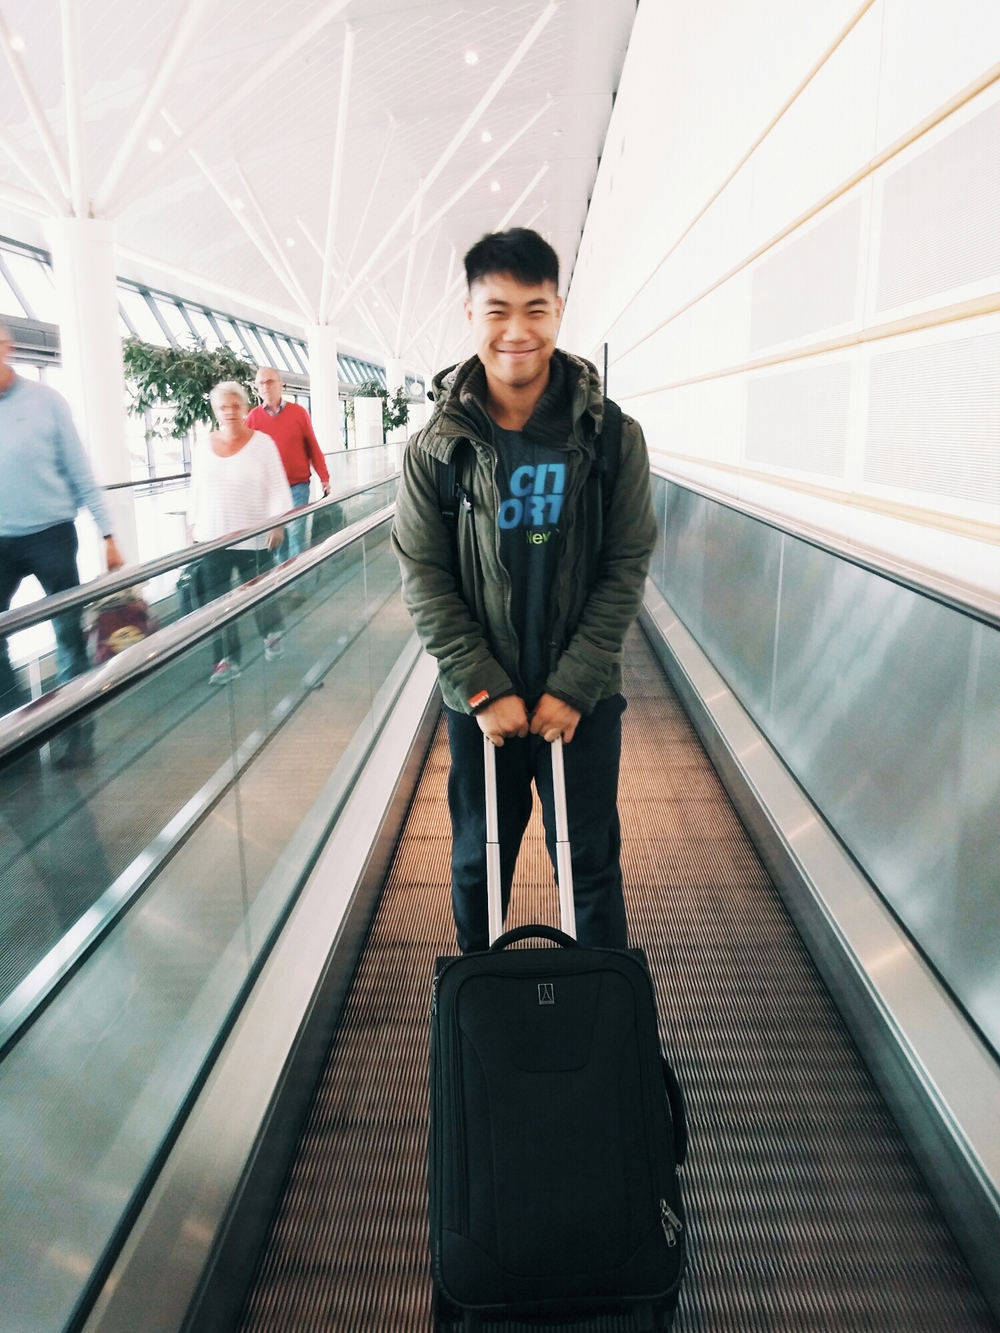 {My travel buddy!}